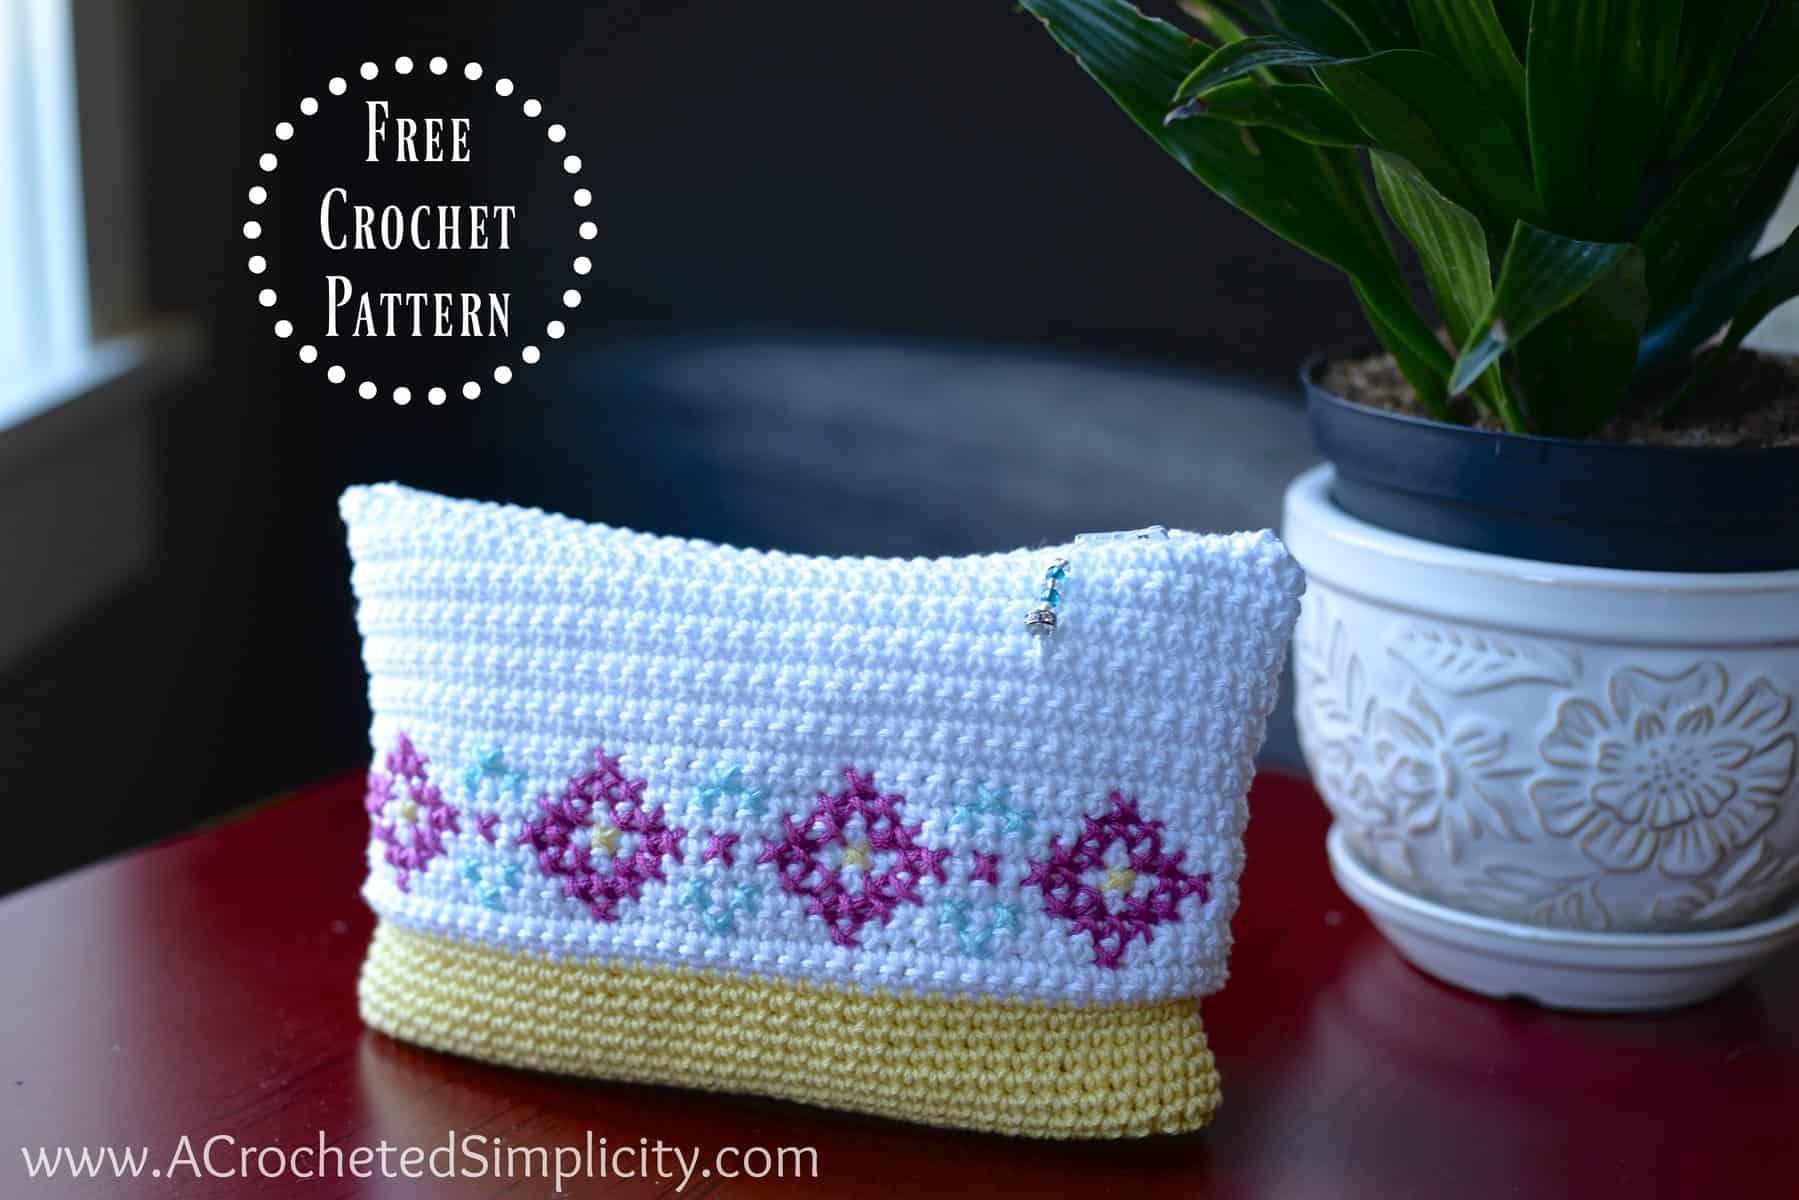 Free Crochet Pattern - Cross Stitch Make-Up Bag / Pouch - A ...